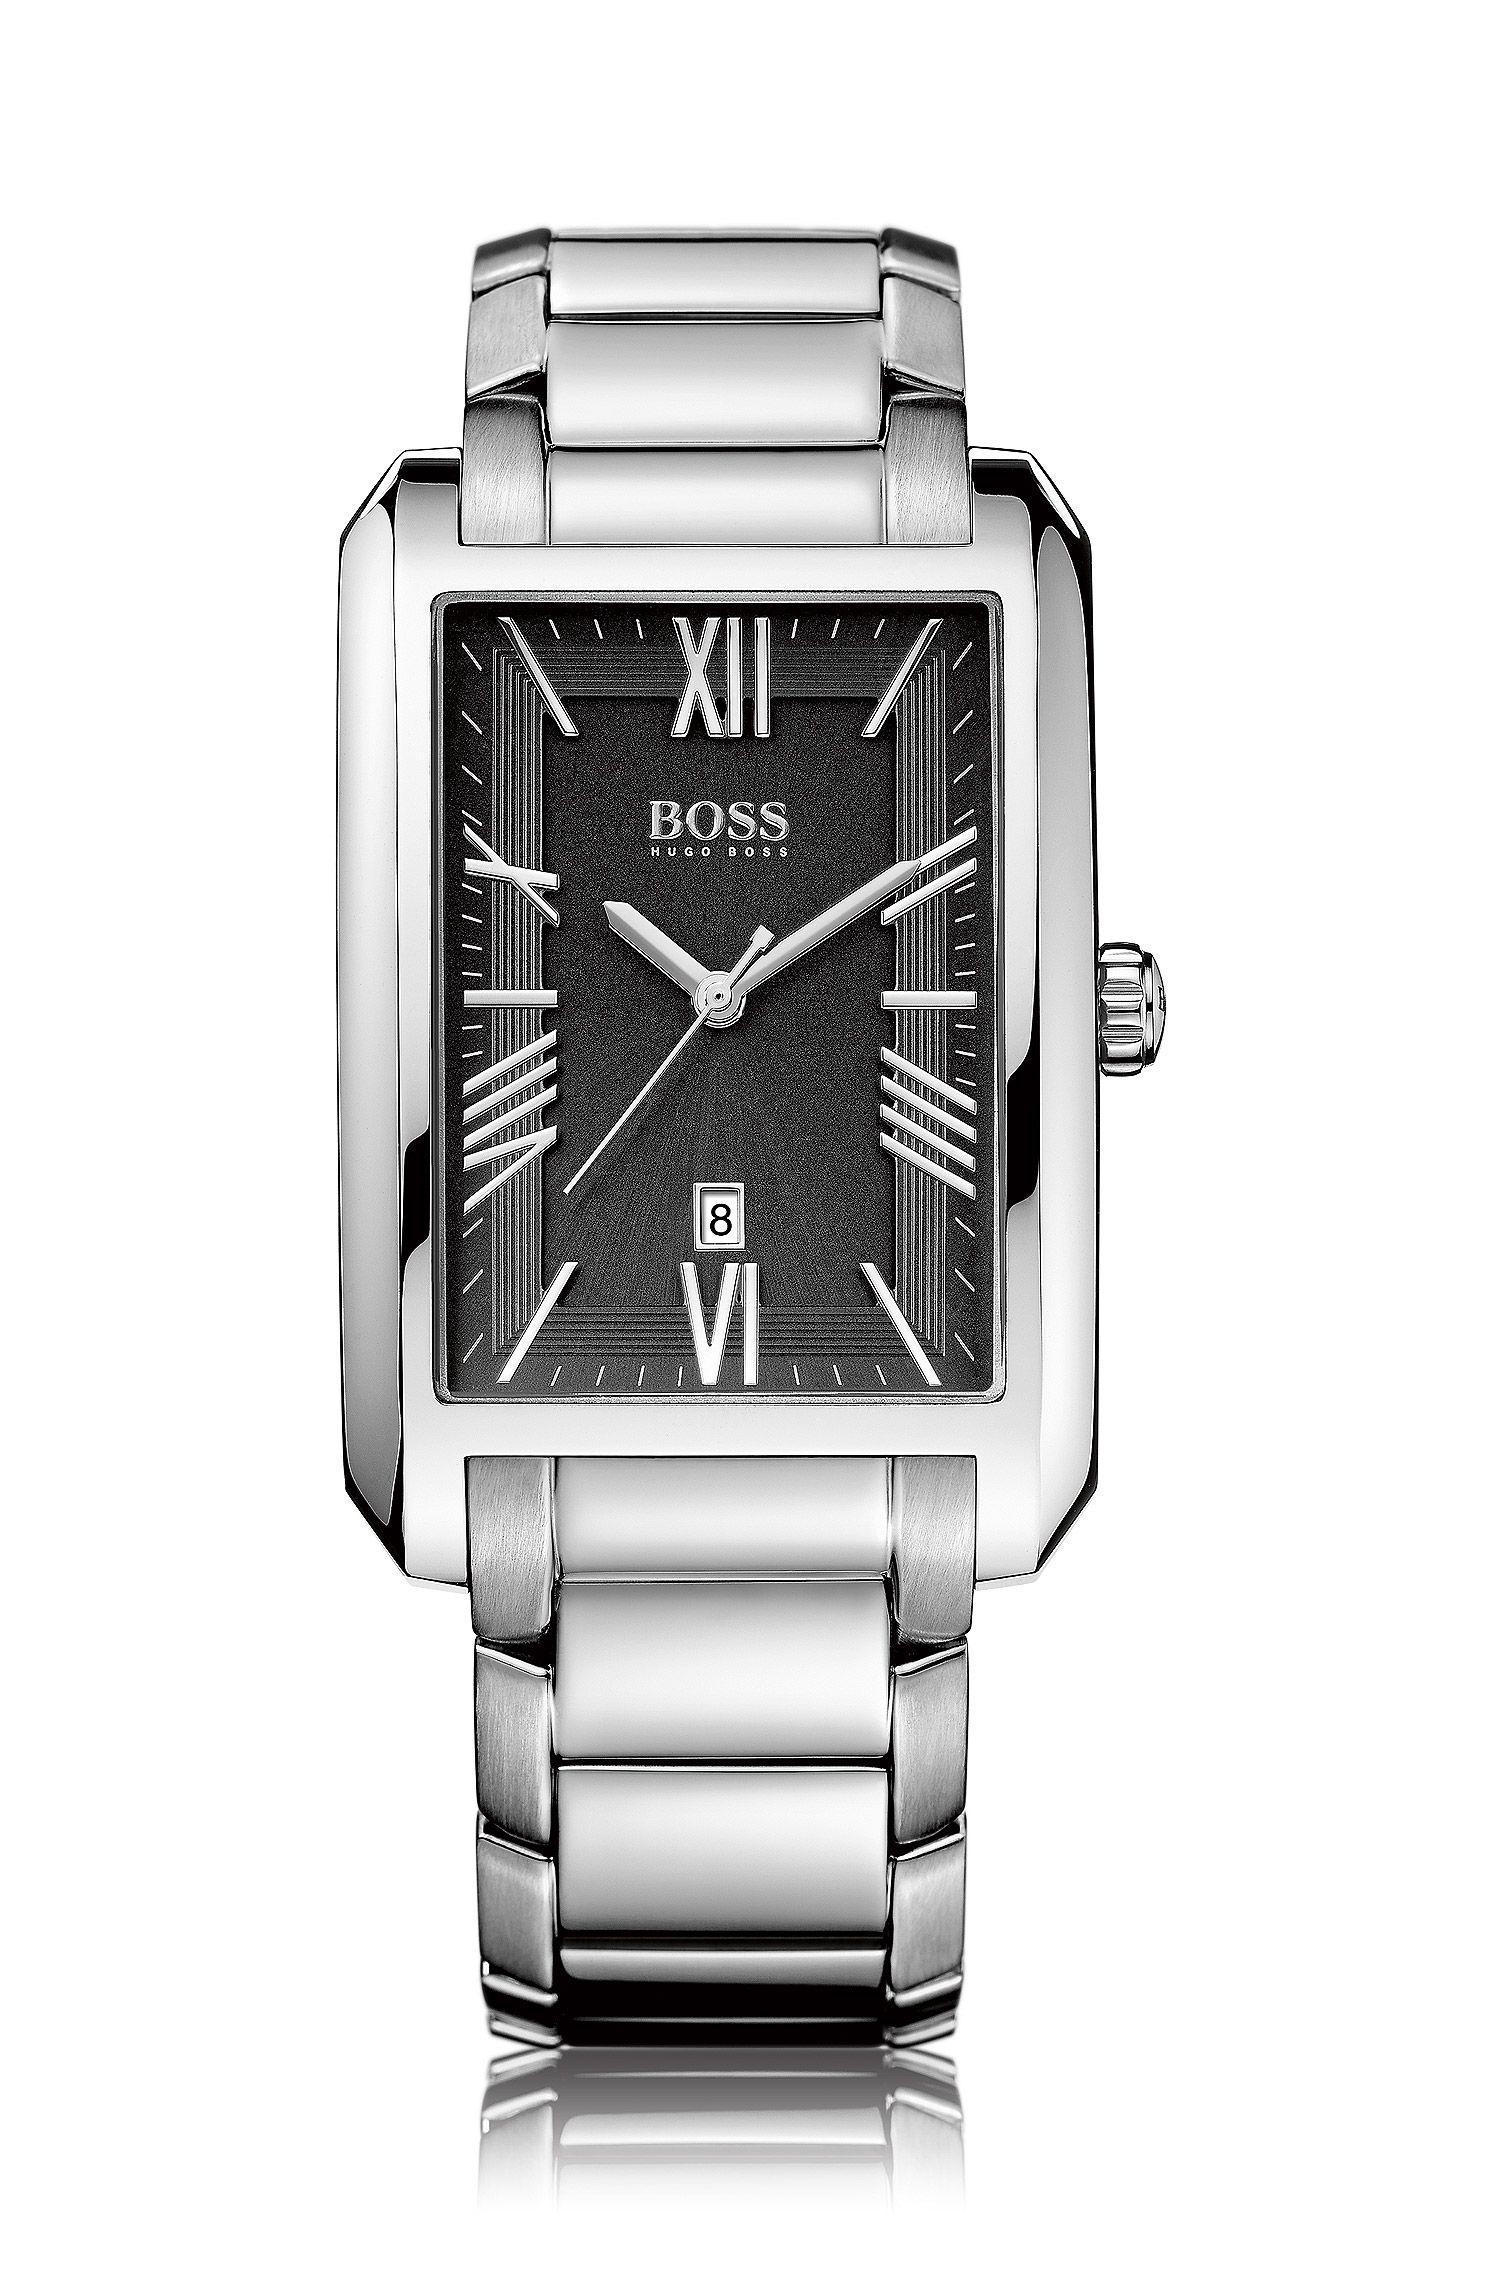 Montre-bracelet «HB6039» avec boîtier en acier inoxydable